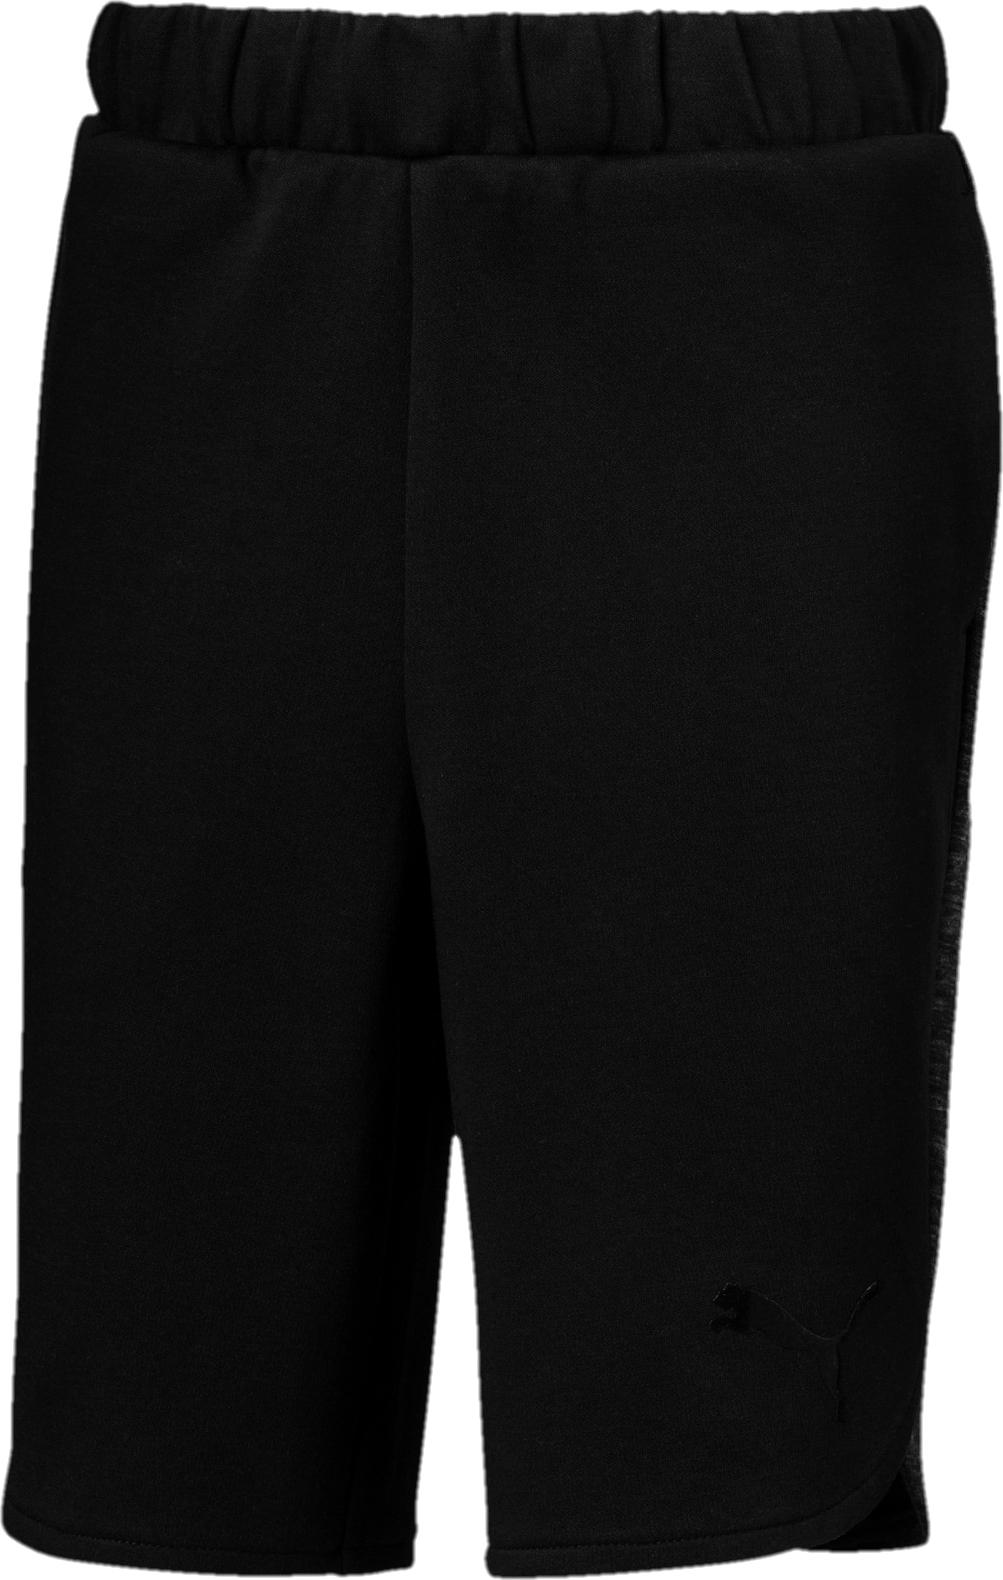 Шорты PUMA шорты мужские puma athletics shorts 8 цвет серый 85414203 размер l 50